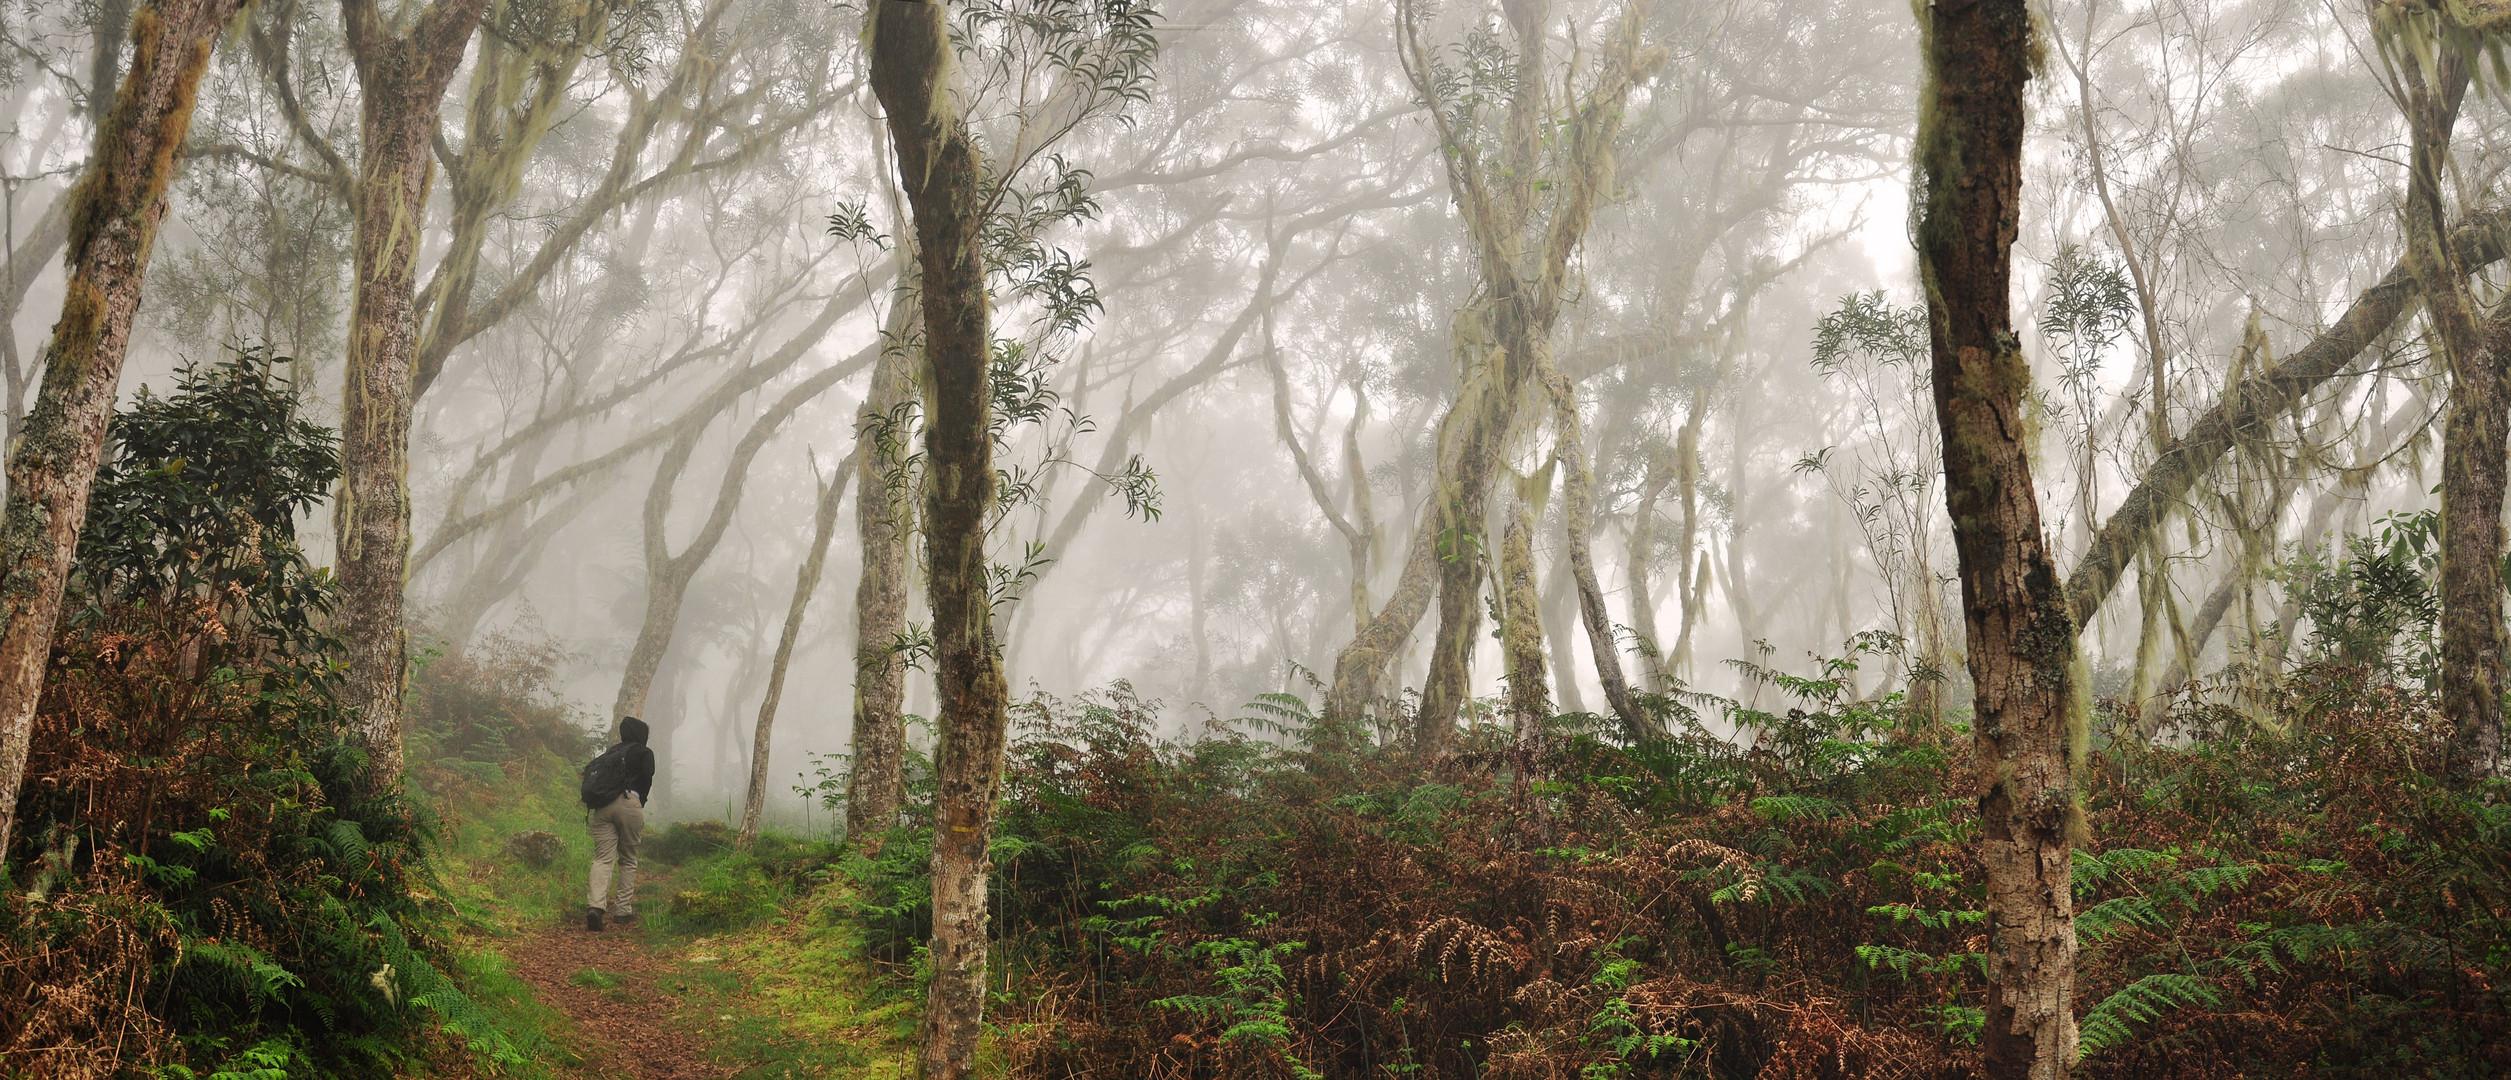 Im Tamarindenwald